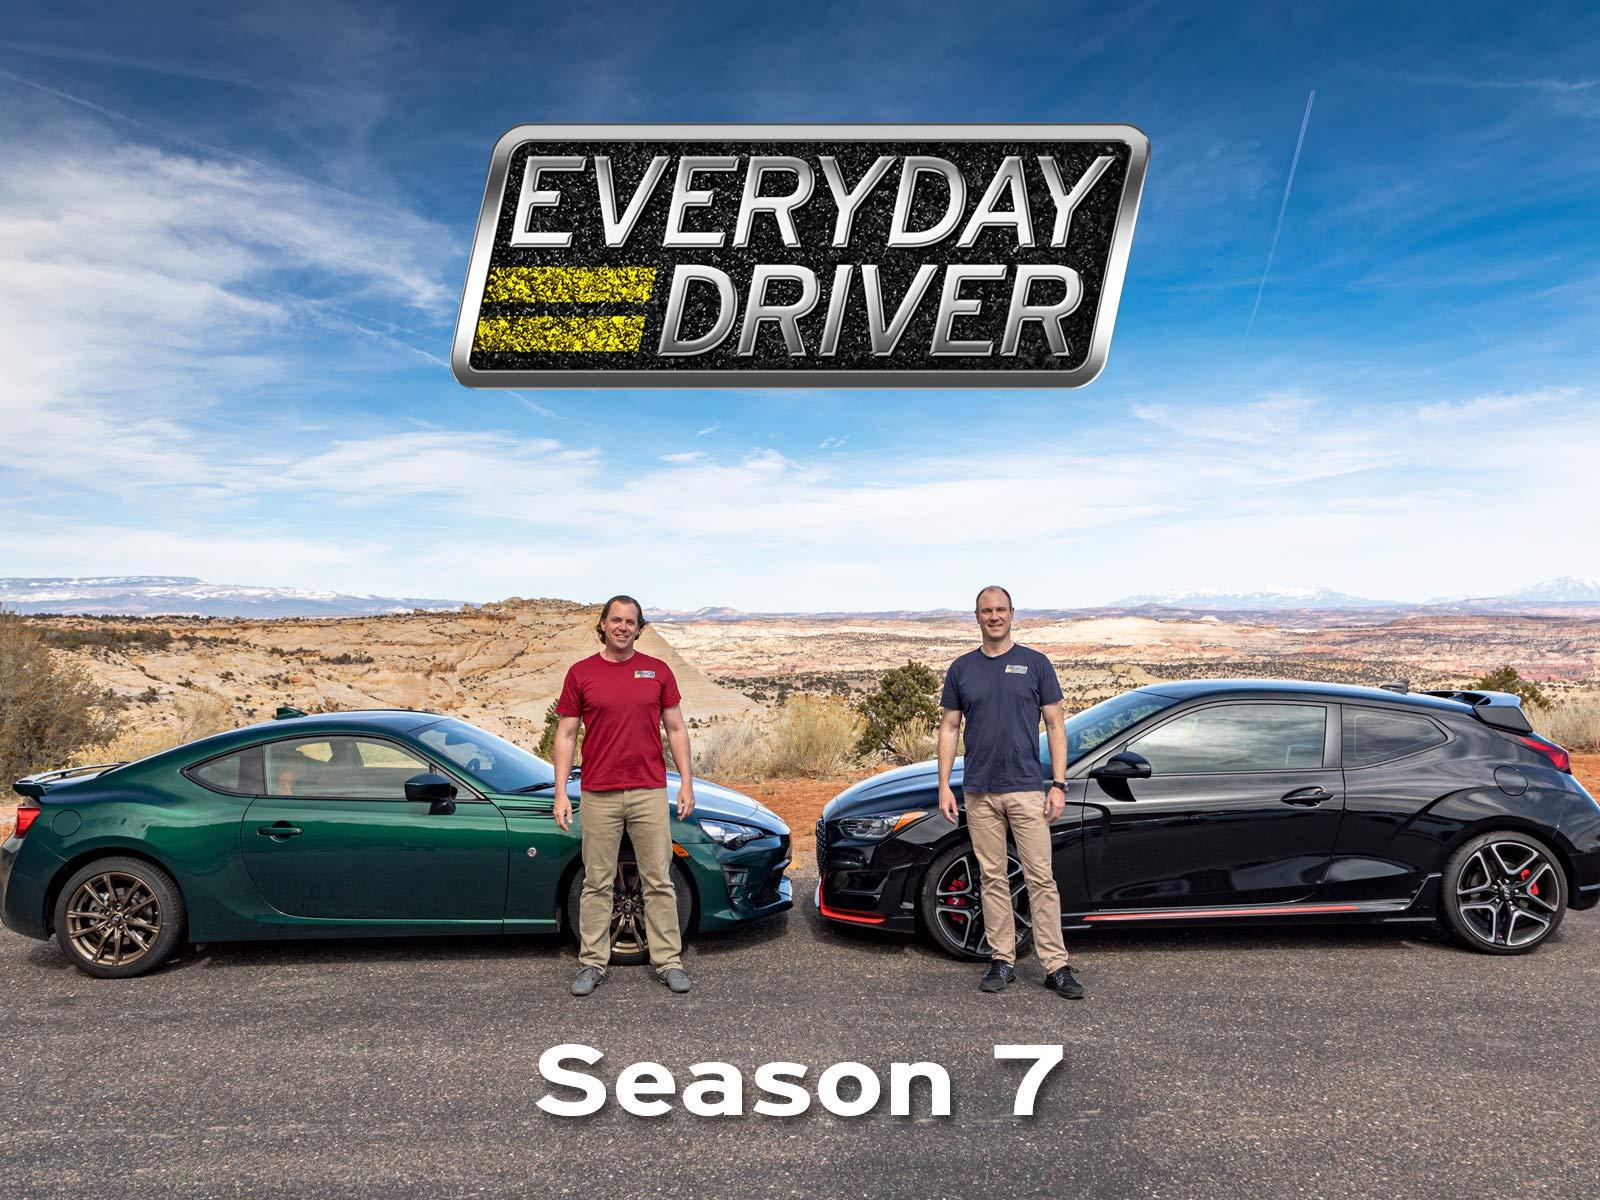 Everyday Driver - Season 7